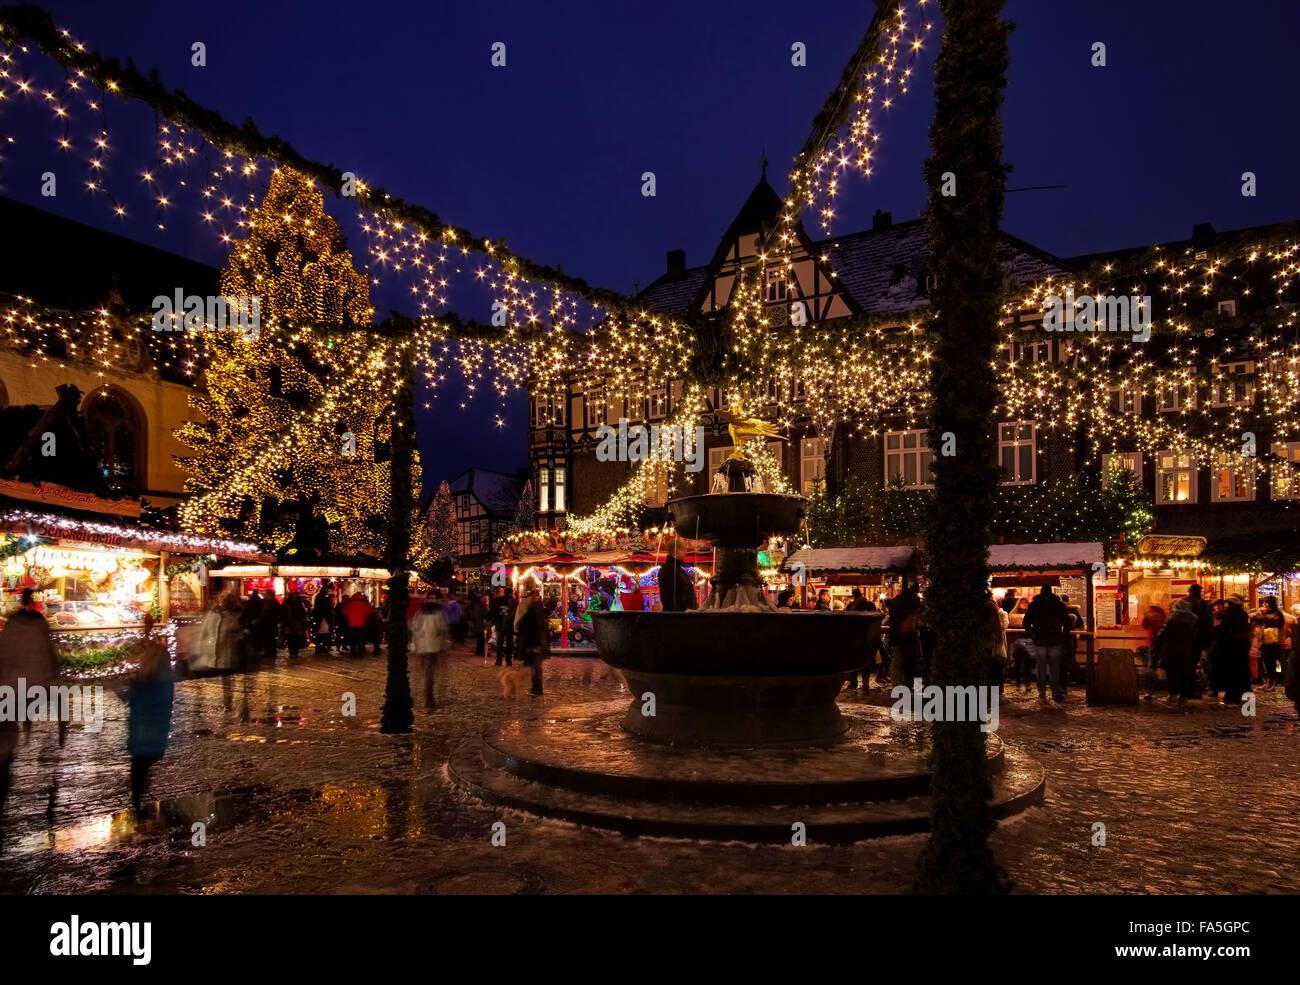 Goslar Weihnachtsmarkt.Goslar Weihnachtsmarkt Goslar Christmas Market 01 Stock